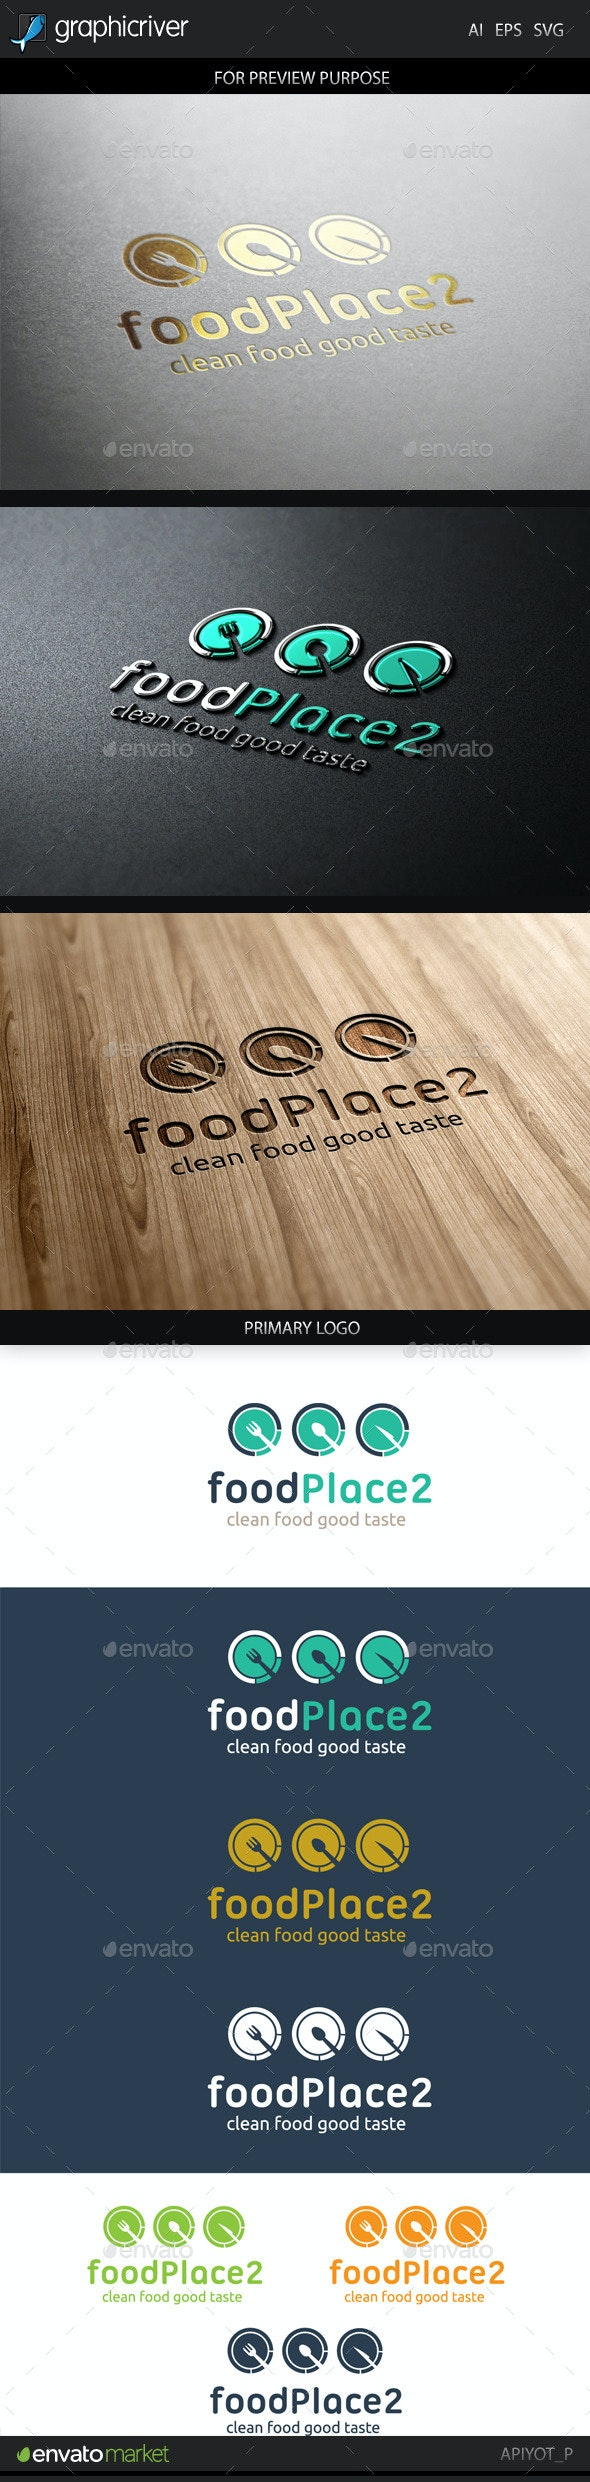 Food Place 2 Logo - Food Logo Templates